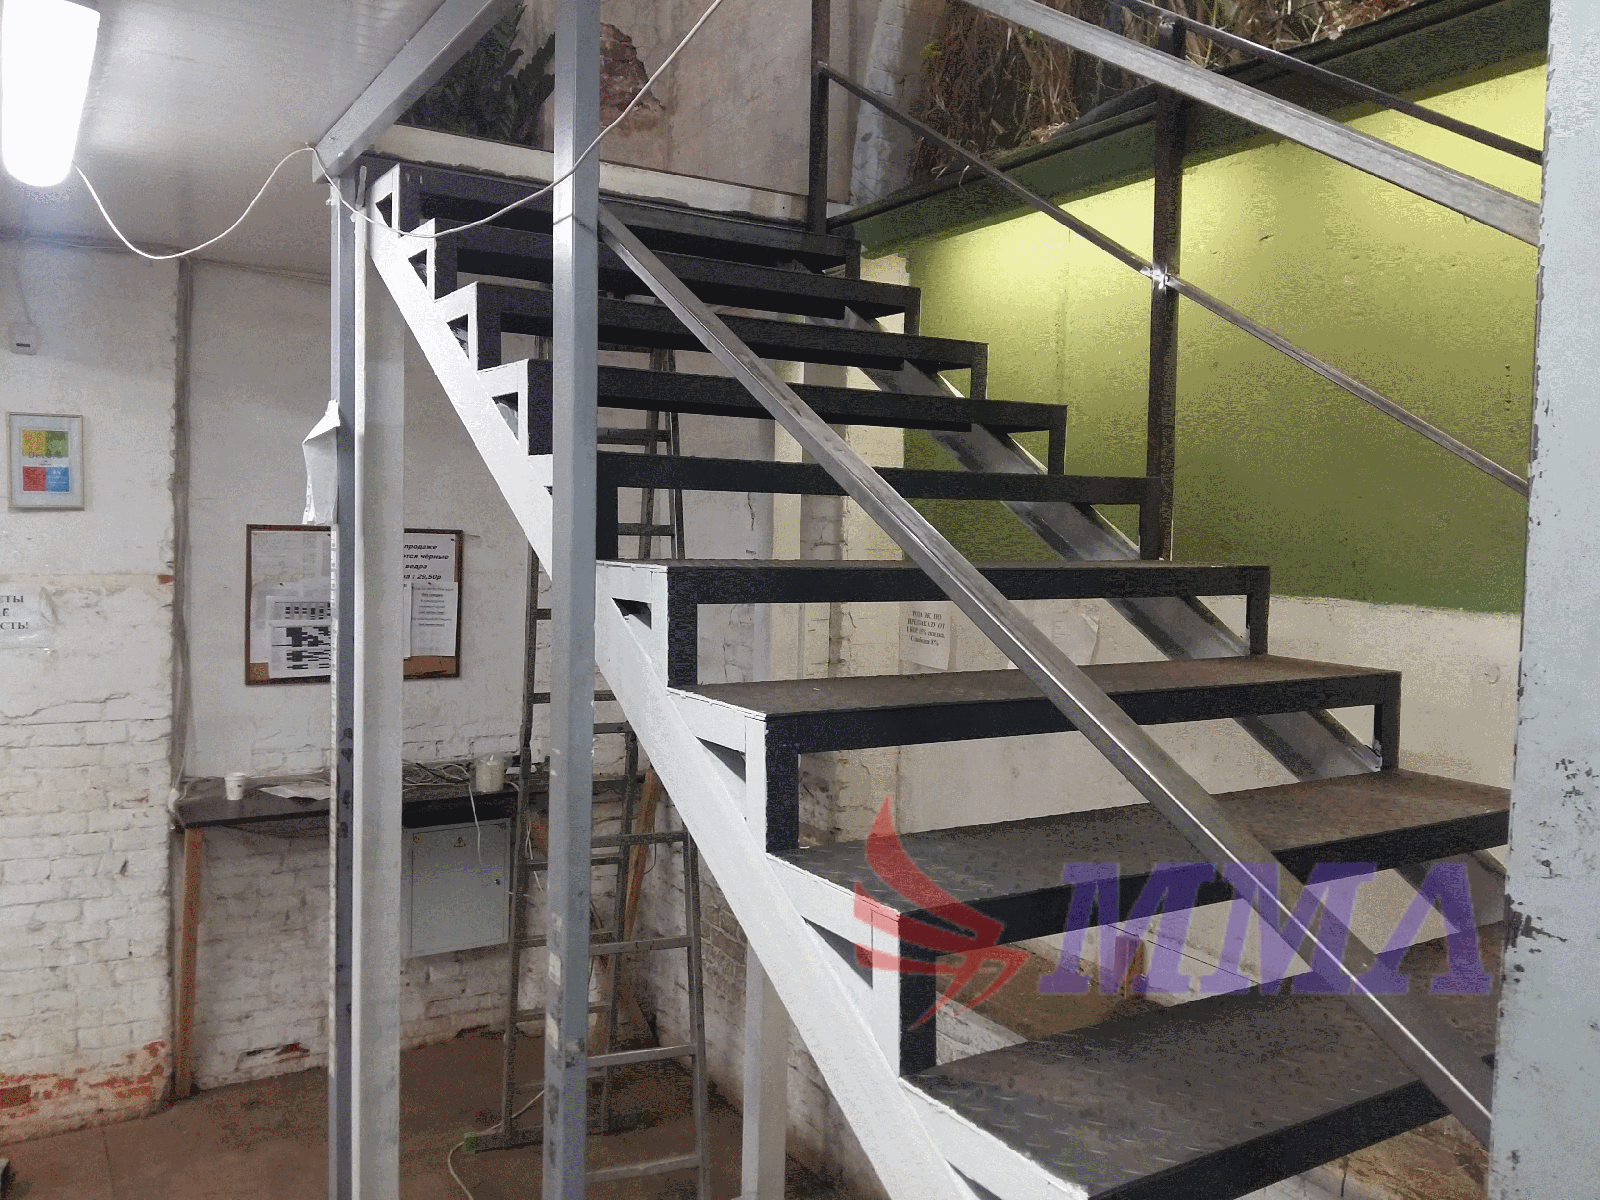 пожарная лестница, металлокаркас, каркас, лестница,